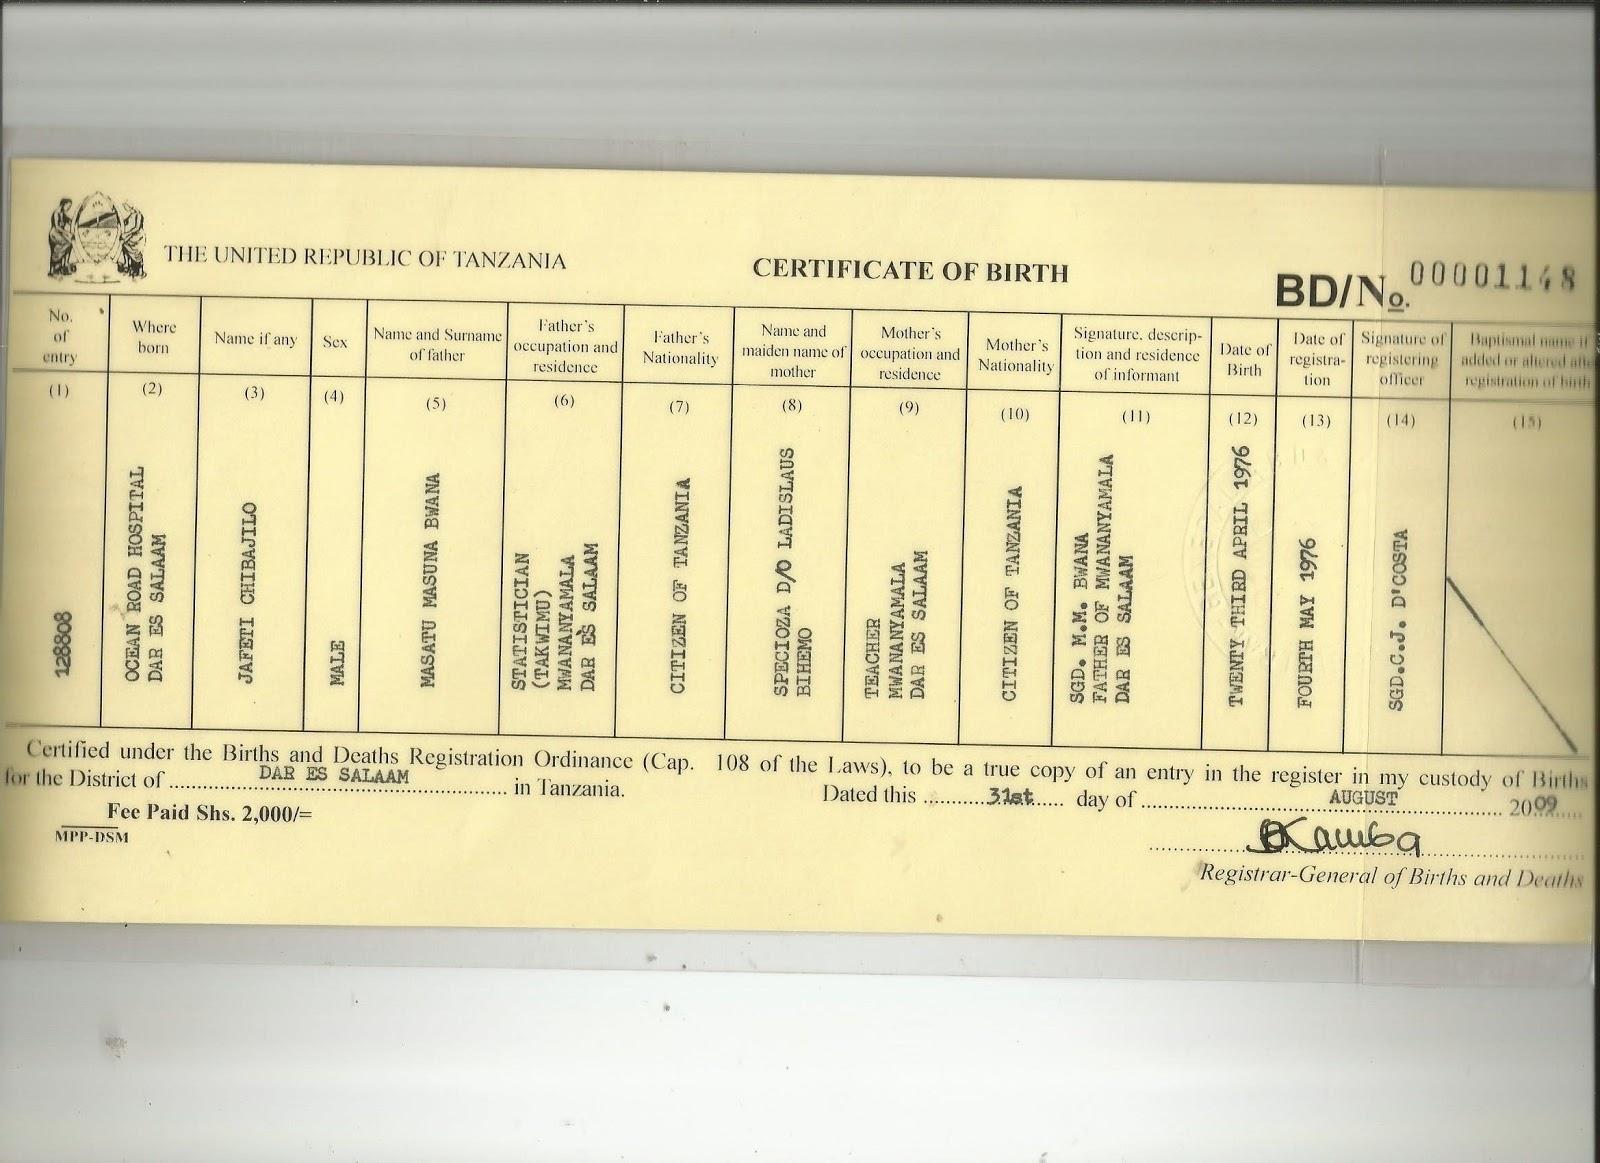 Mwl japhet masatu blog japhet chibajilo masatu certificate of japhet chibajilo masatu certificate of birth 23 04 1976 ocean road hospital dar es salaam tanzania xflitez Choice Image